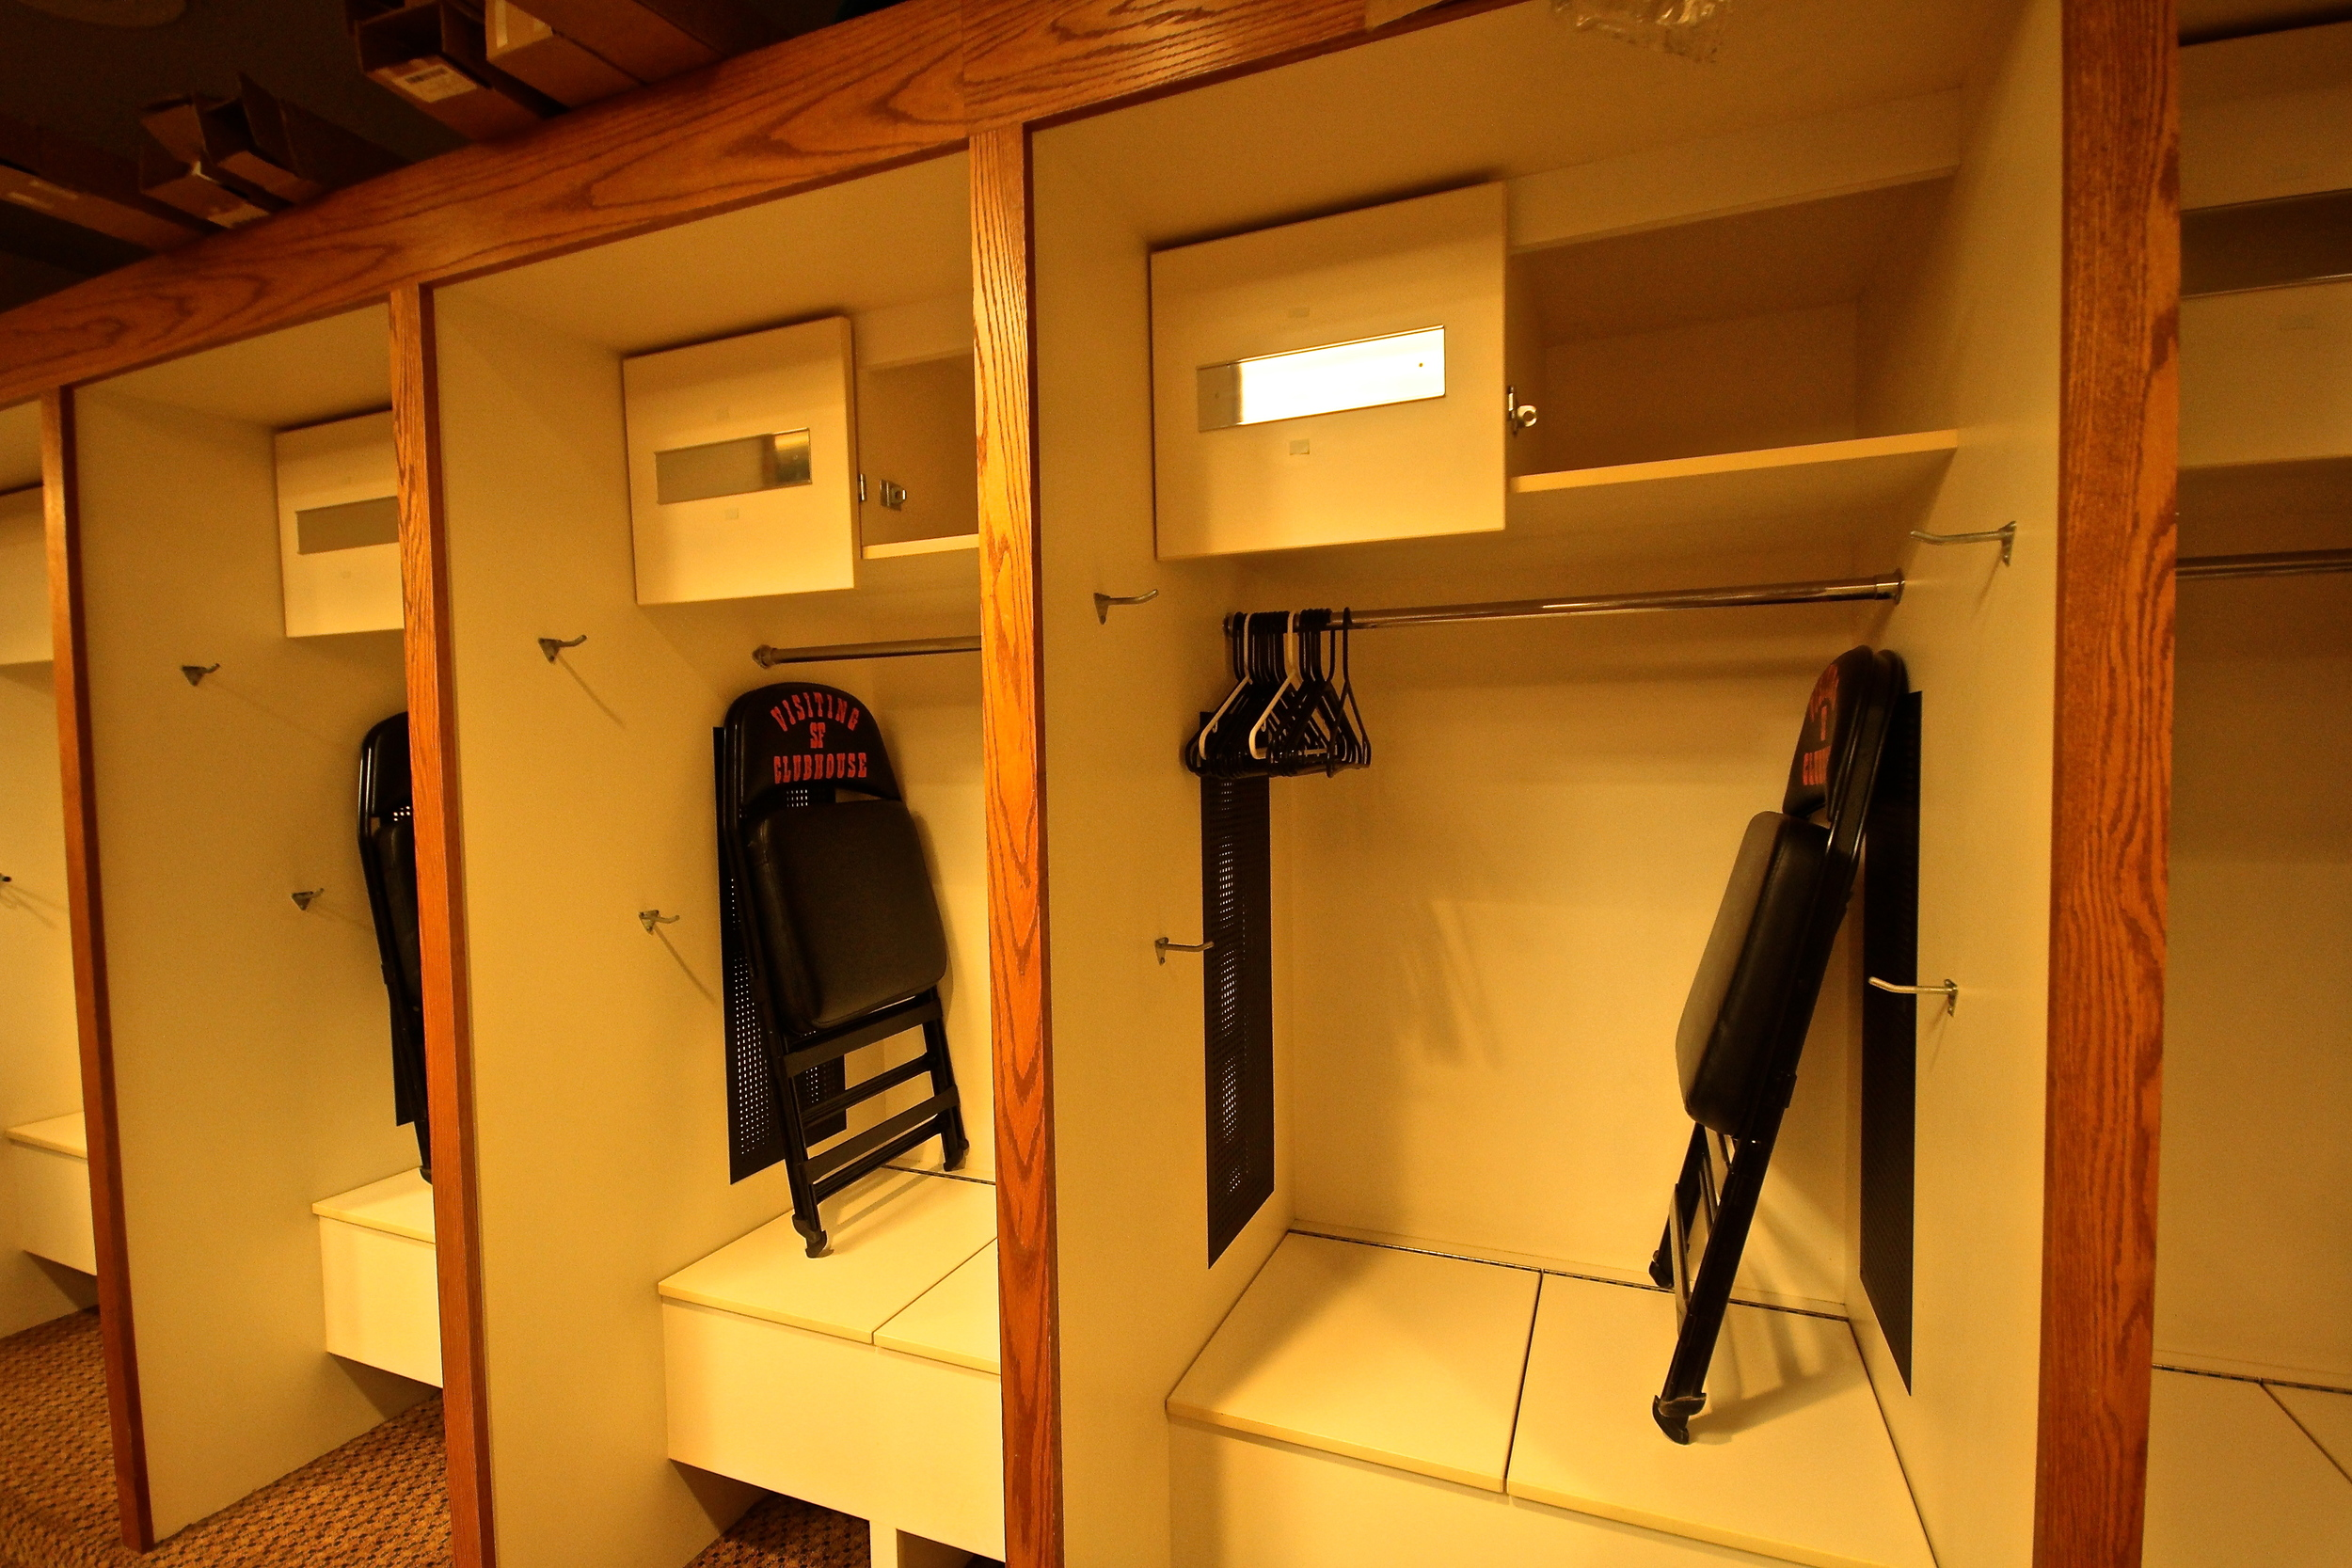 Visitor's lockers